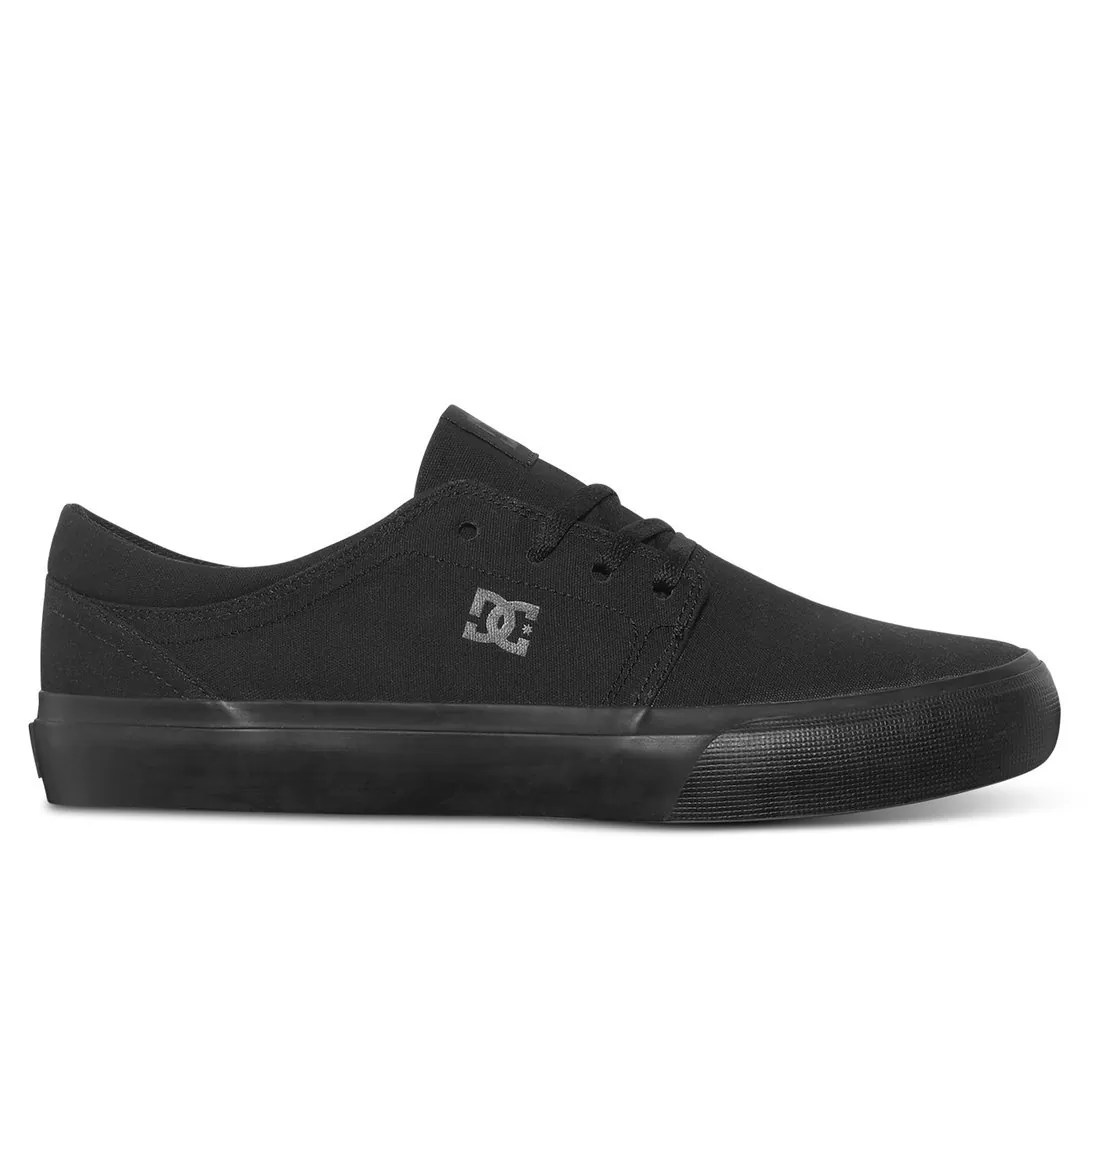 DC Women's Trase TX Skate Shoe Black, 4 D D US